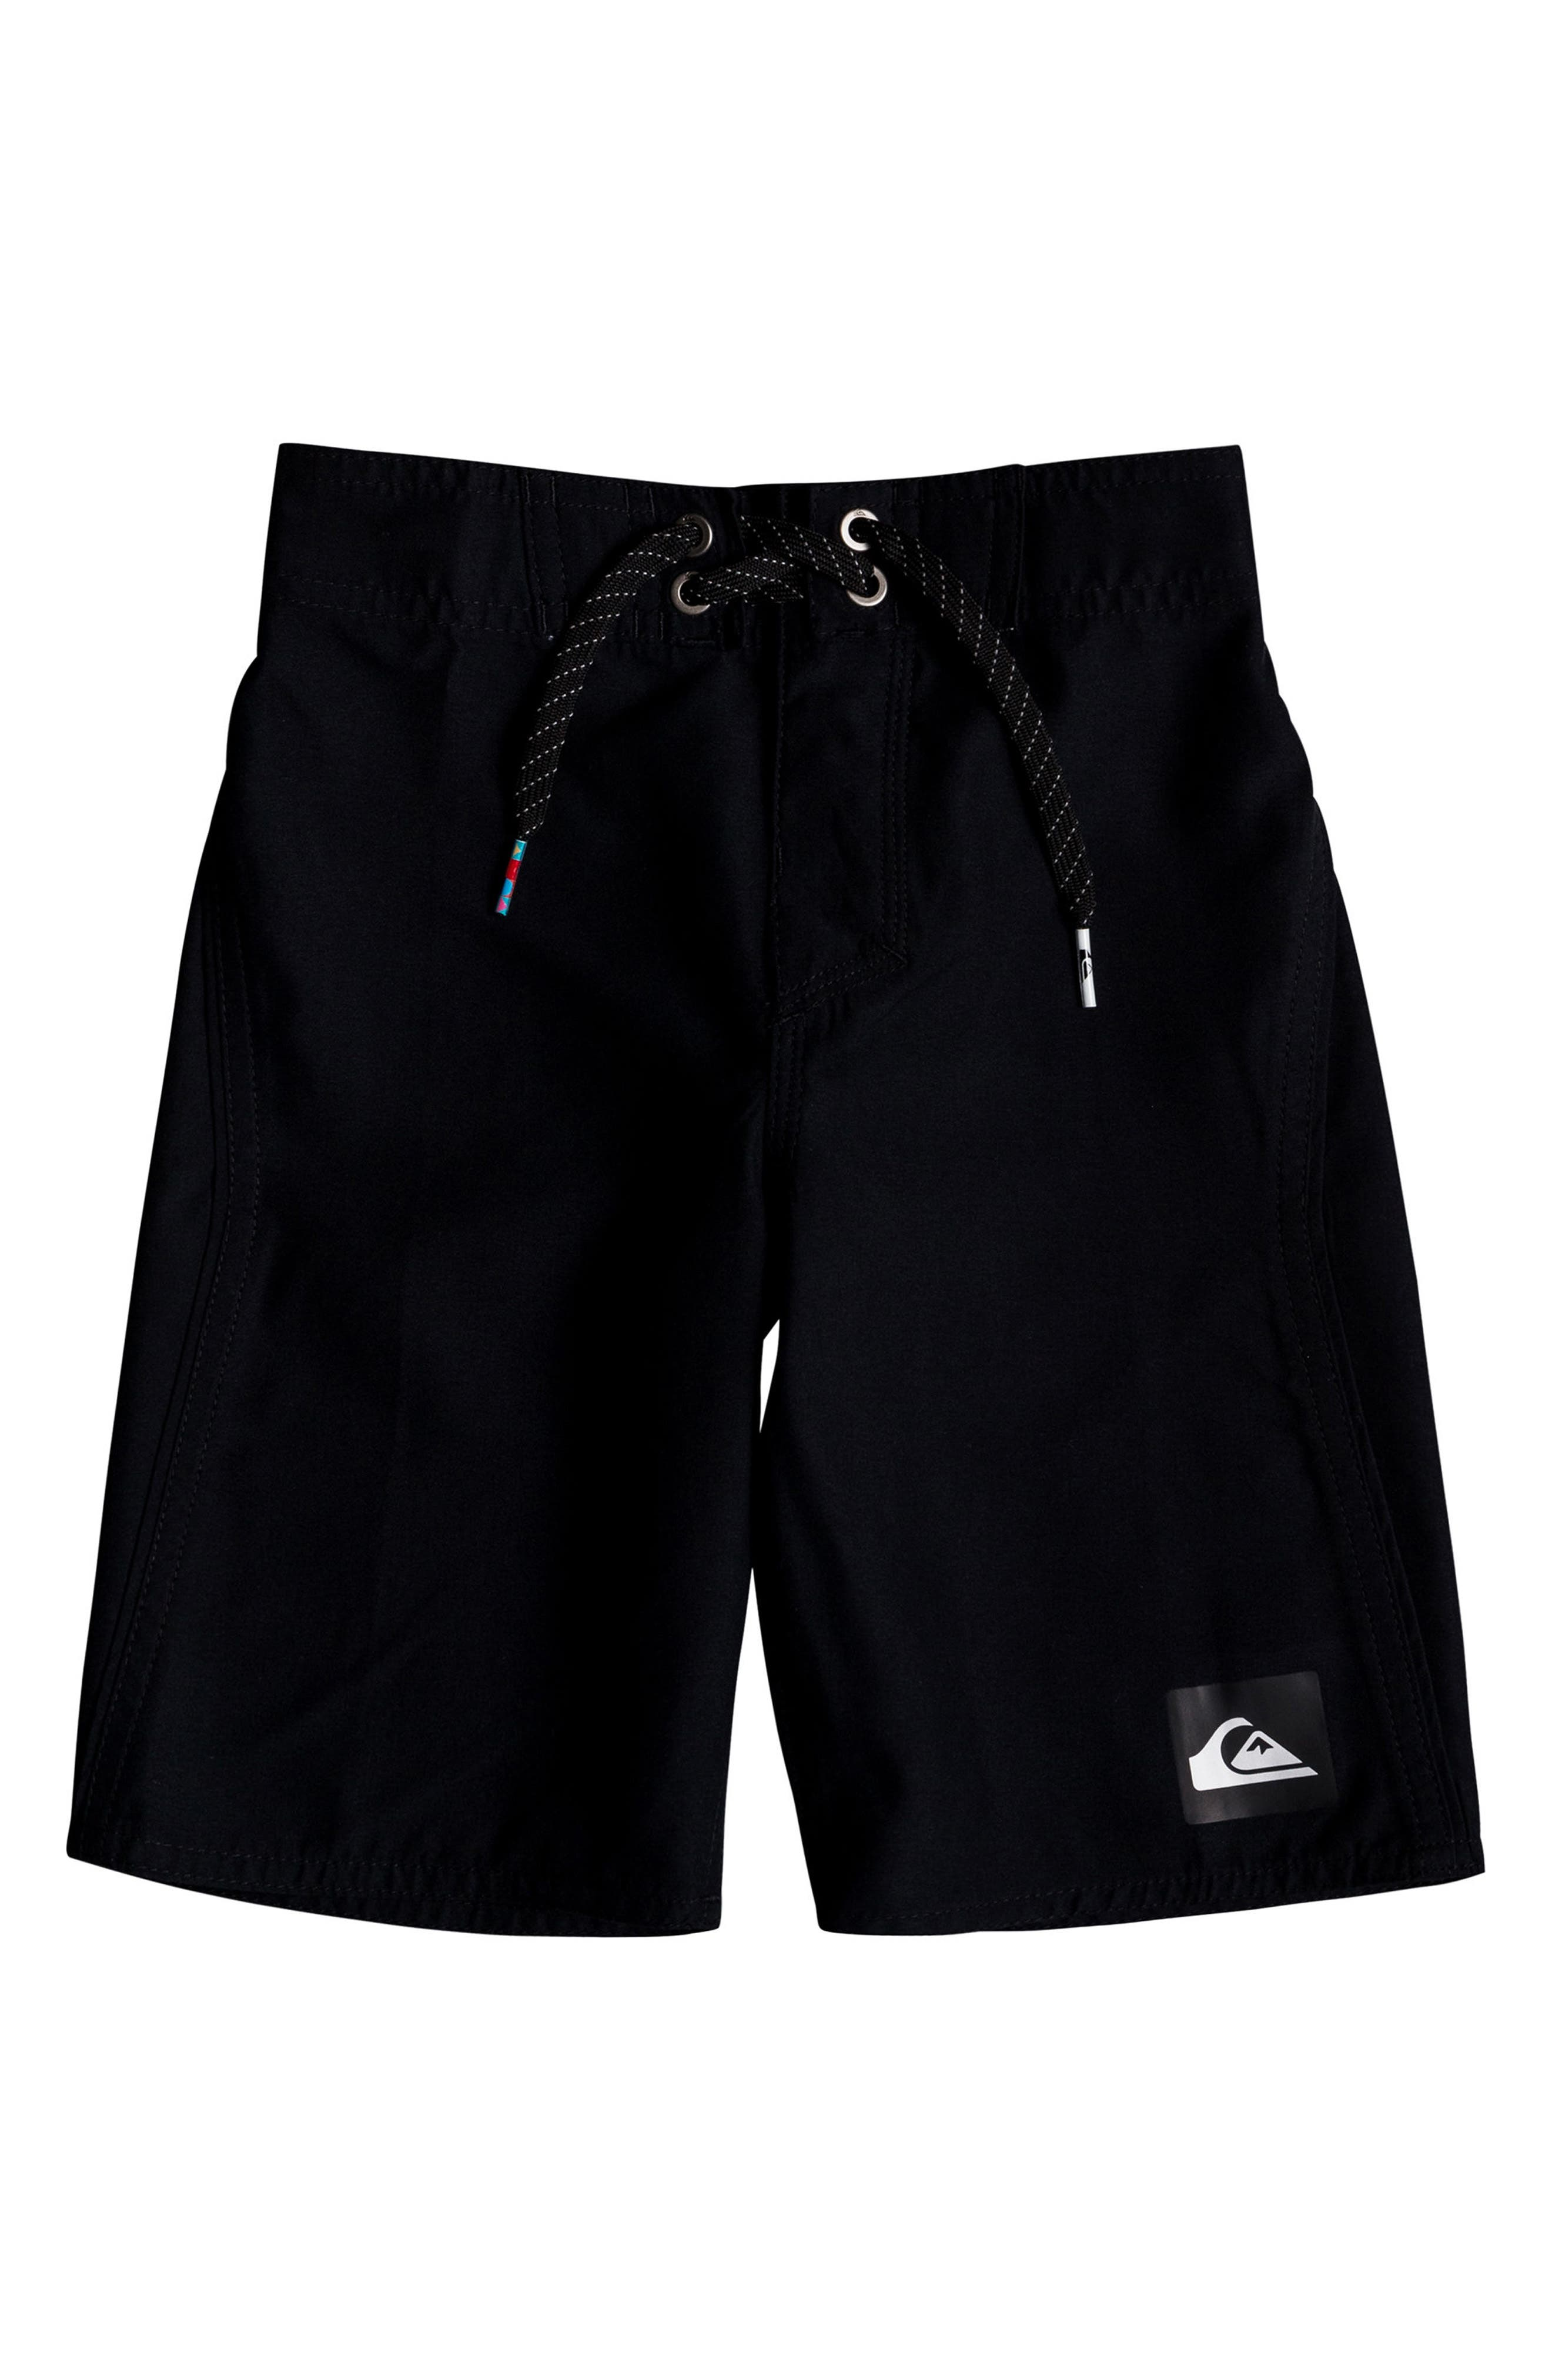 Highline Kaimana Board Shorts,                             Main thumbnail 1, color,                             Black